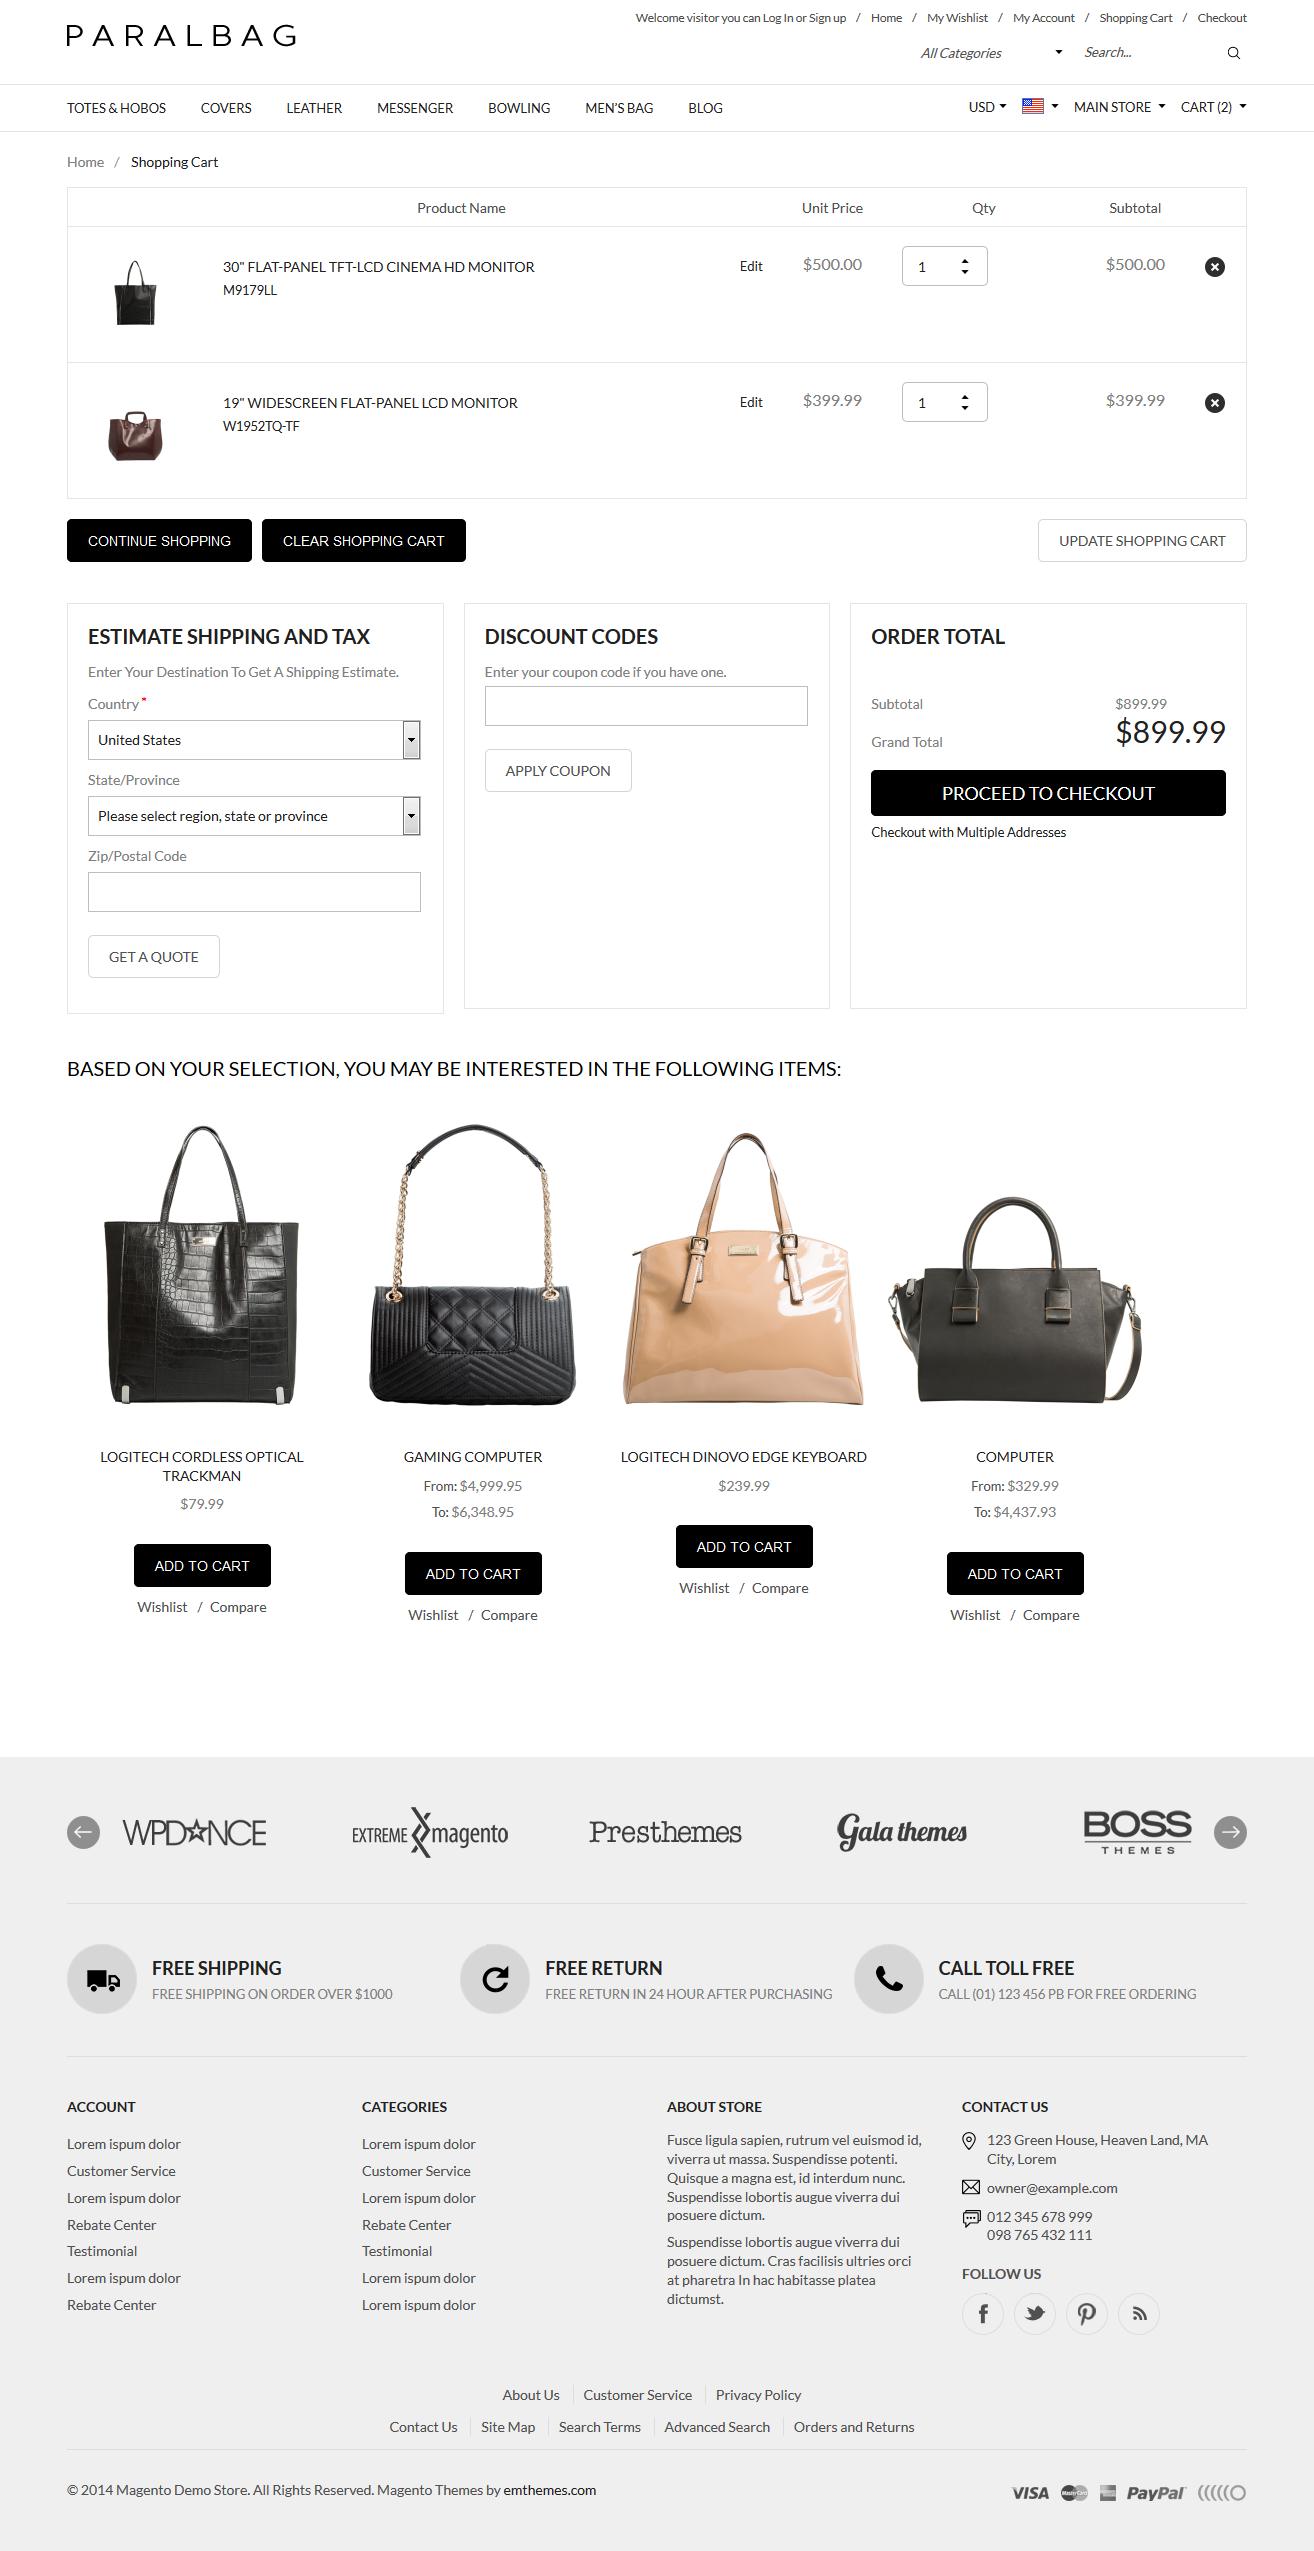 af6053cc2318 Responsive Magento Themes - Parallax Handbags Bags Store by tvlgiao